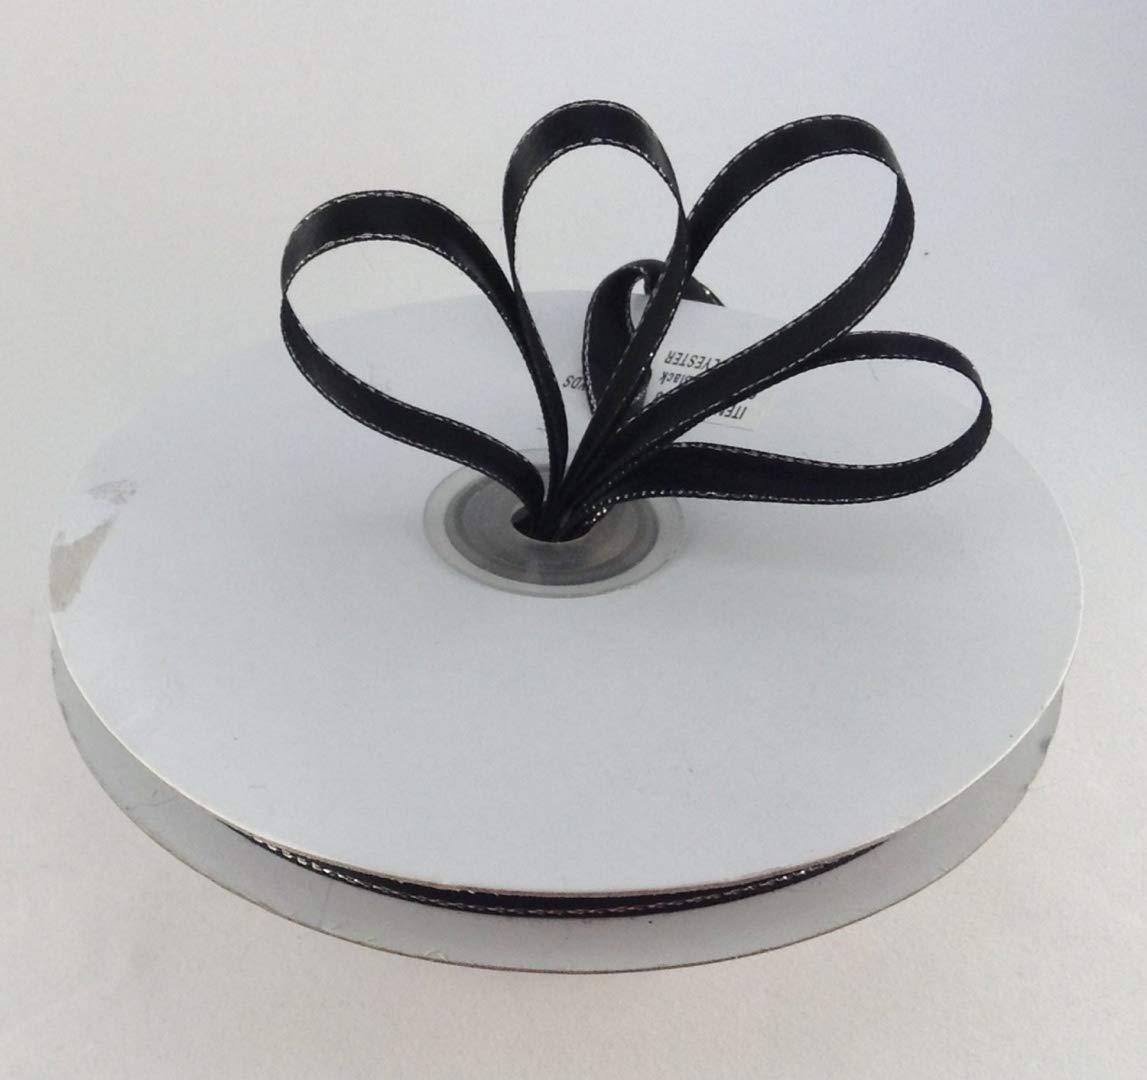 3/8 Black with Silver Edge Satin Ribbon 50 Yards Spool Single Faced Polyester by KCraftDepot   B00FGJN6UQ